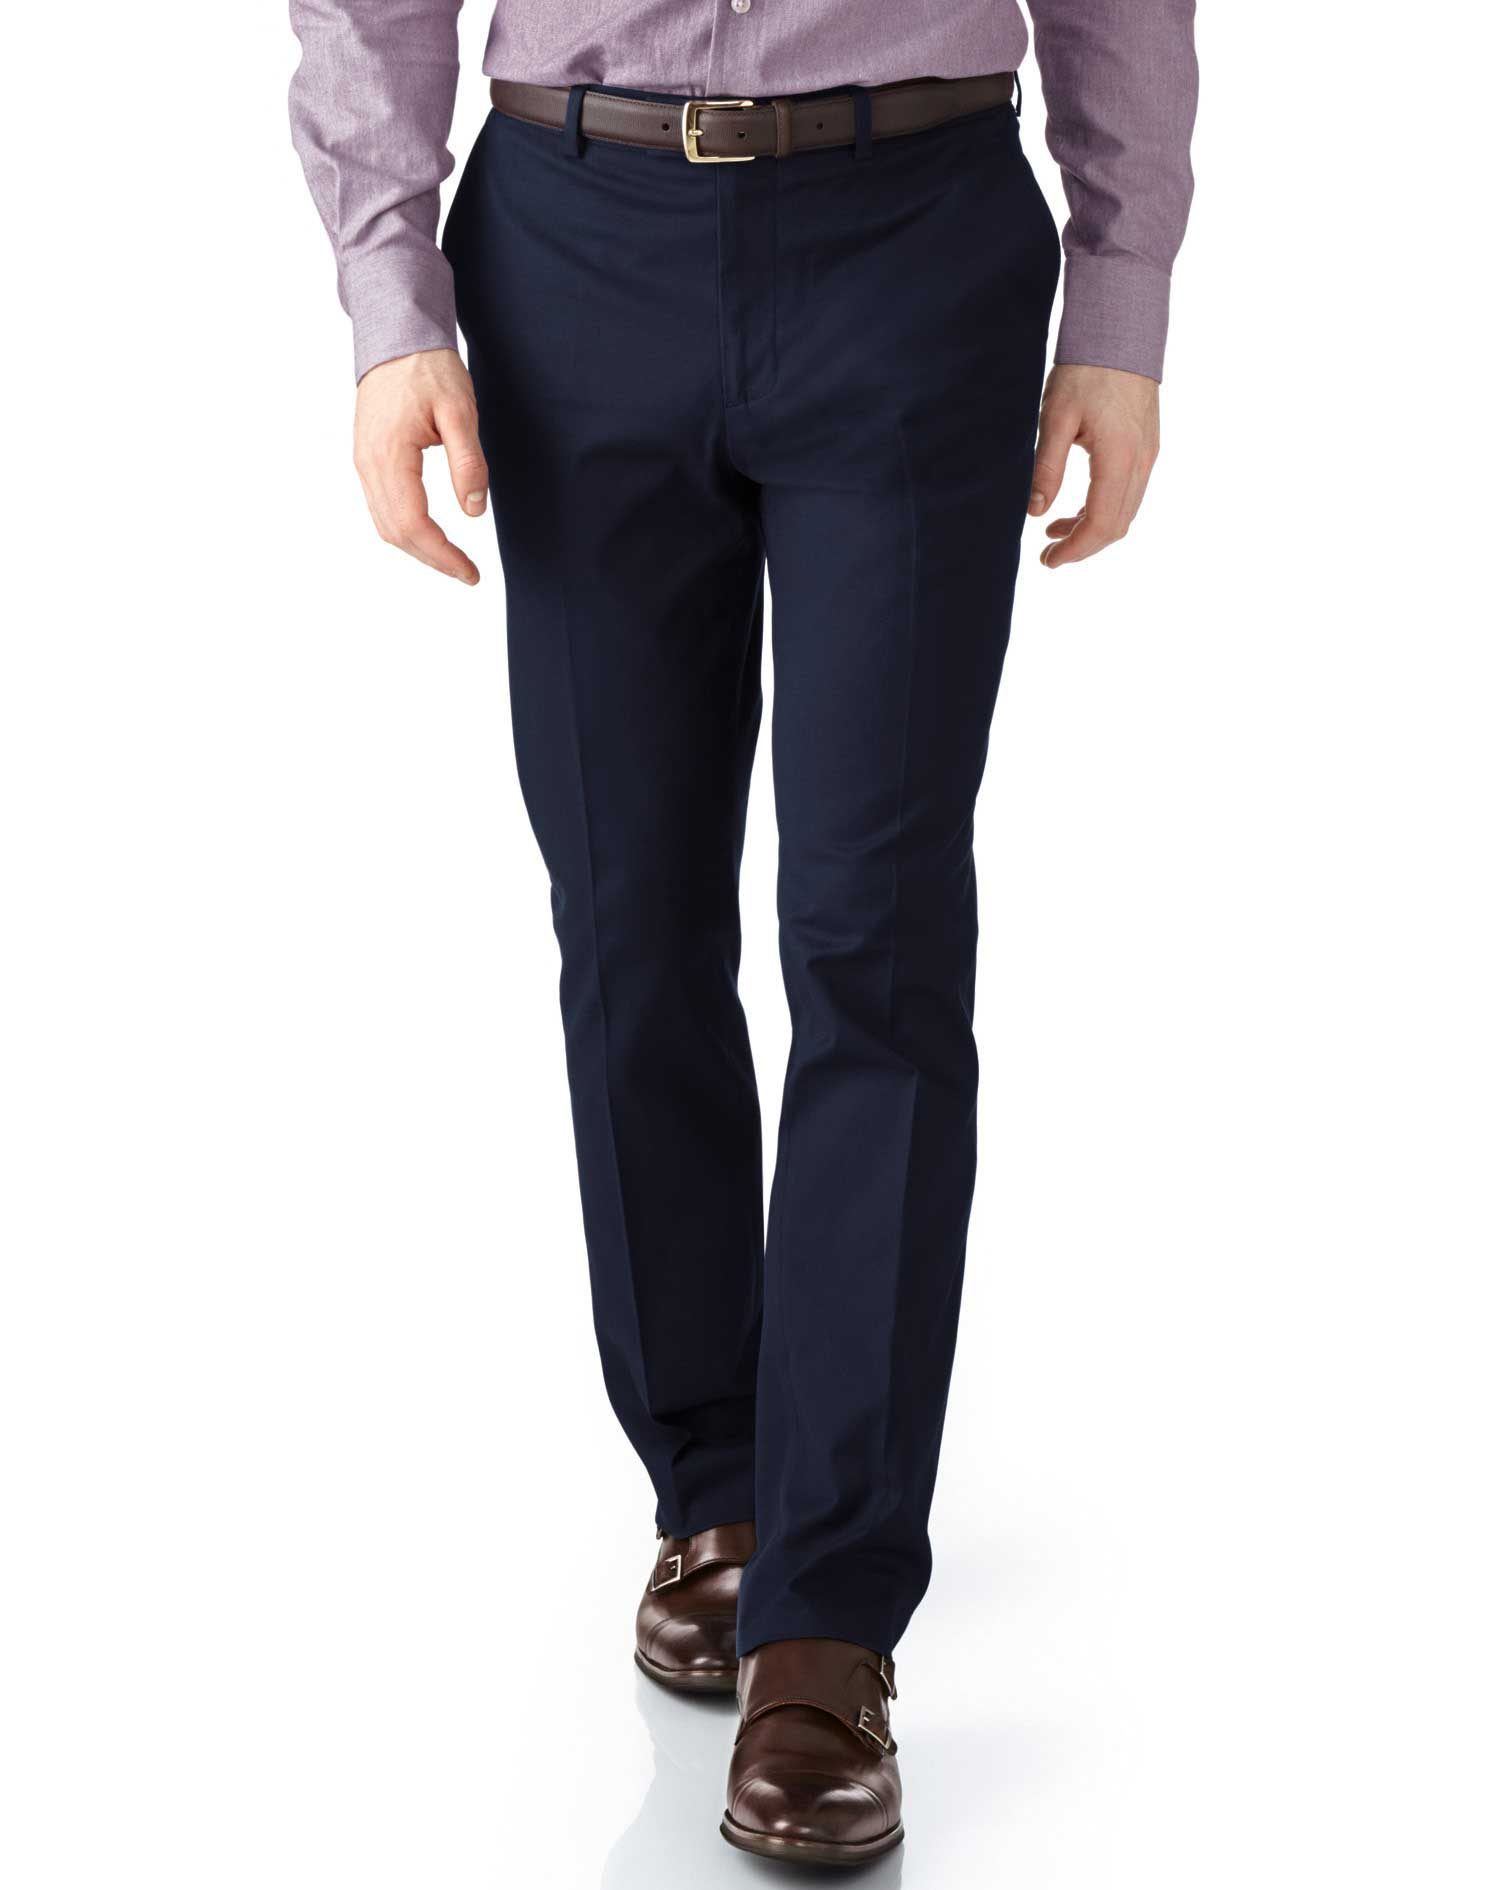 Navy Extra Slim Fit Stretch Cavalry Twill Trousers Size W36 L32 by Charles Tyrwhitt